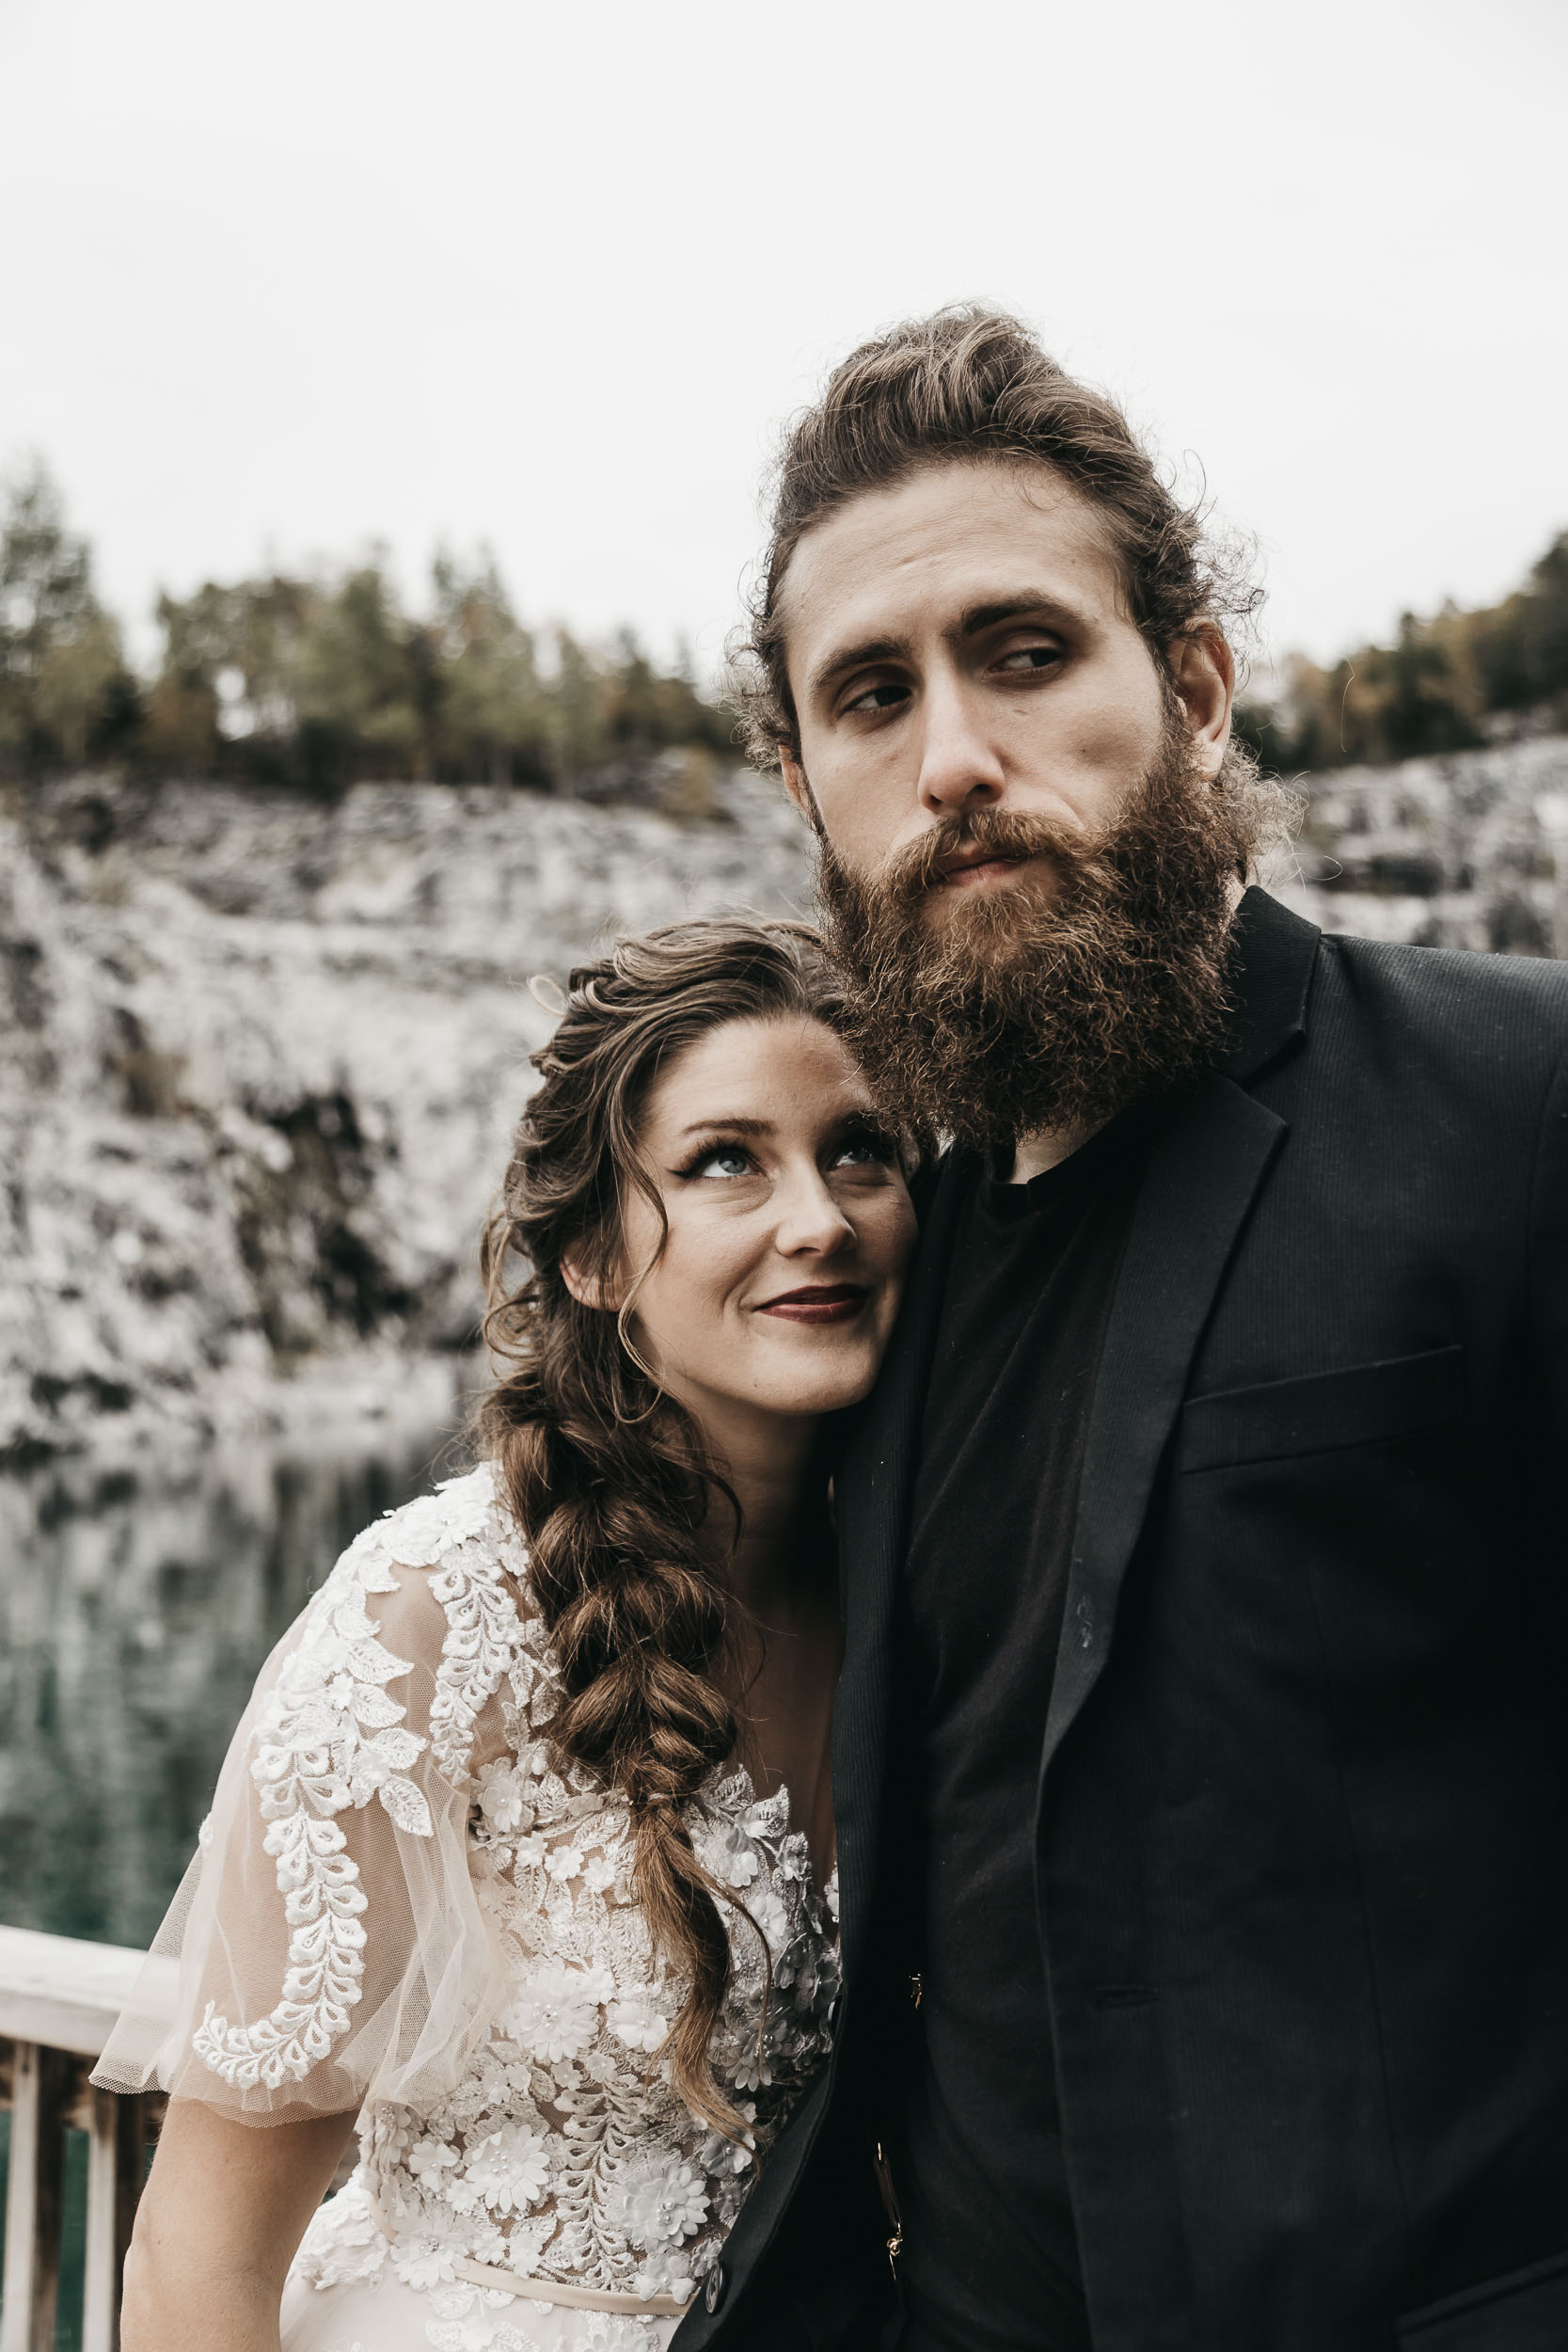 intimate-wedding-elopement-photographer-ottawa-toronto-0209.jpg